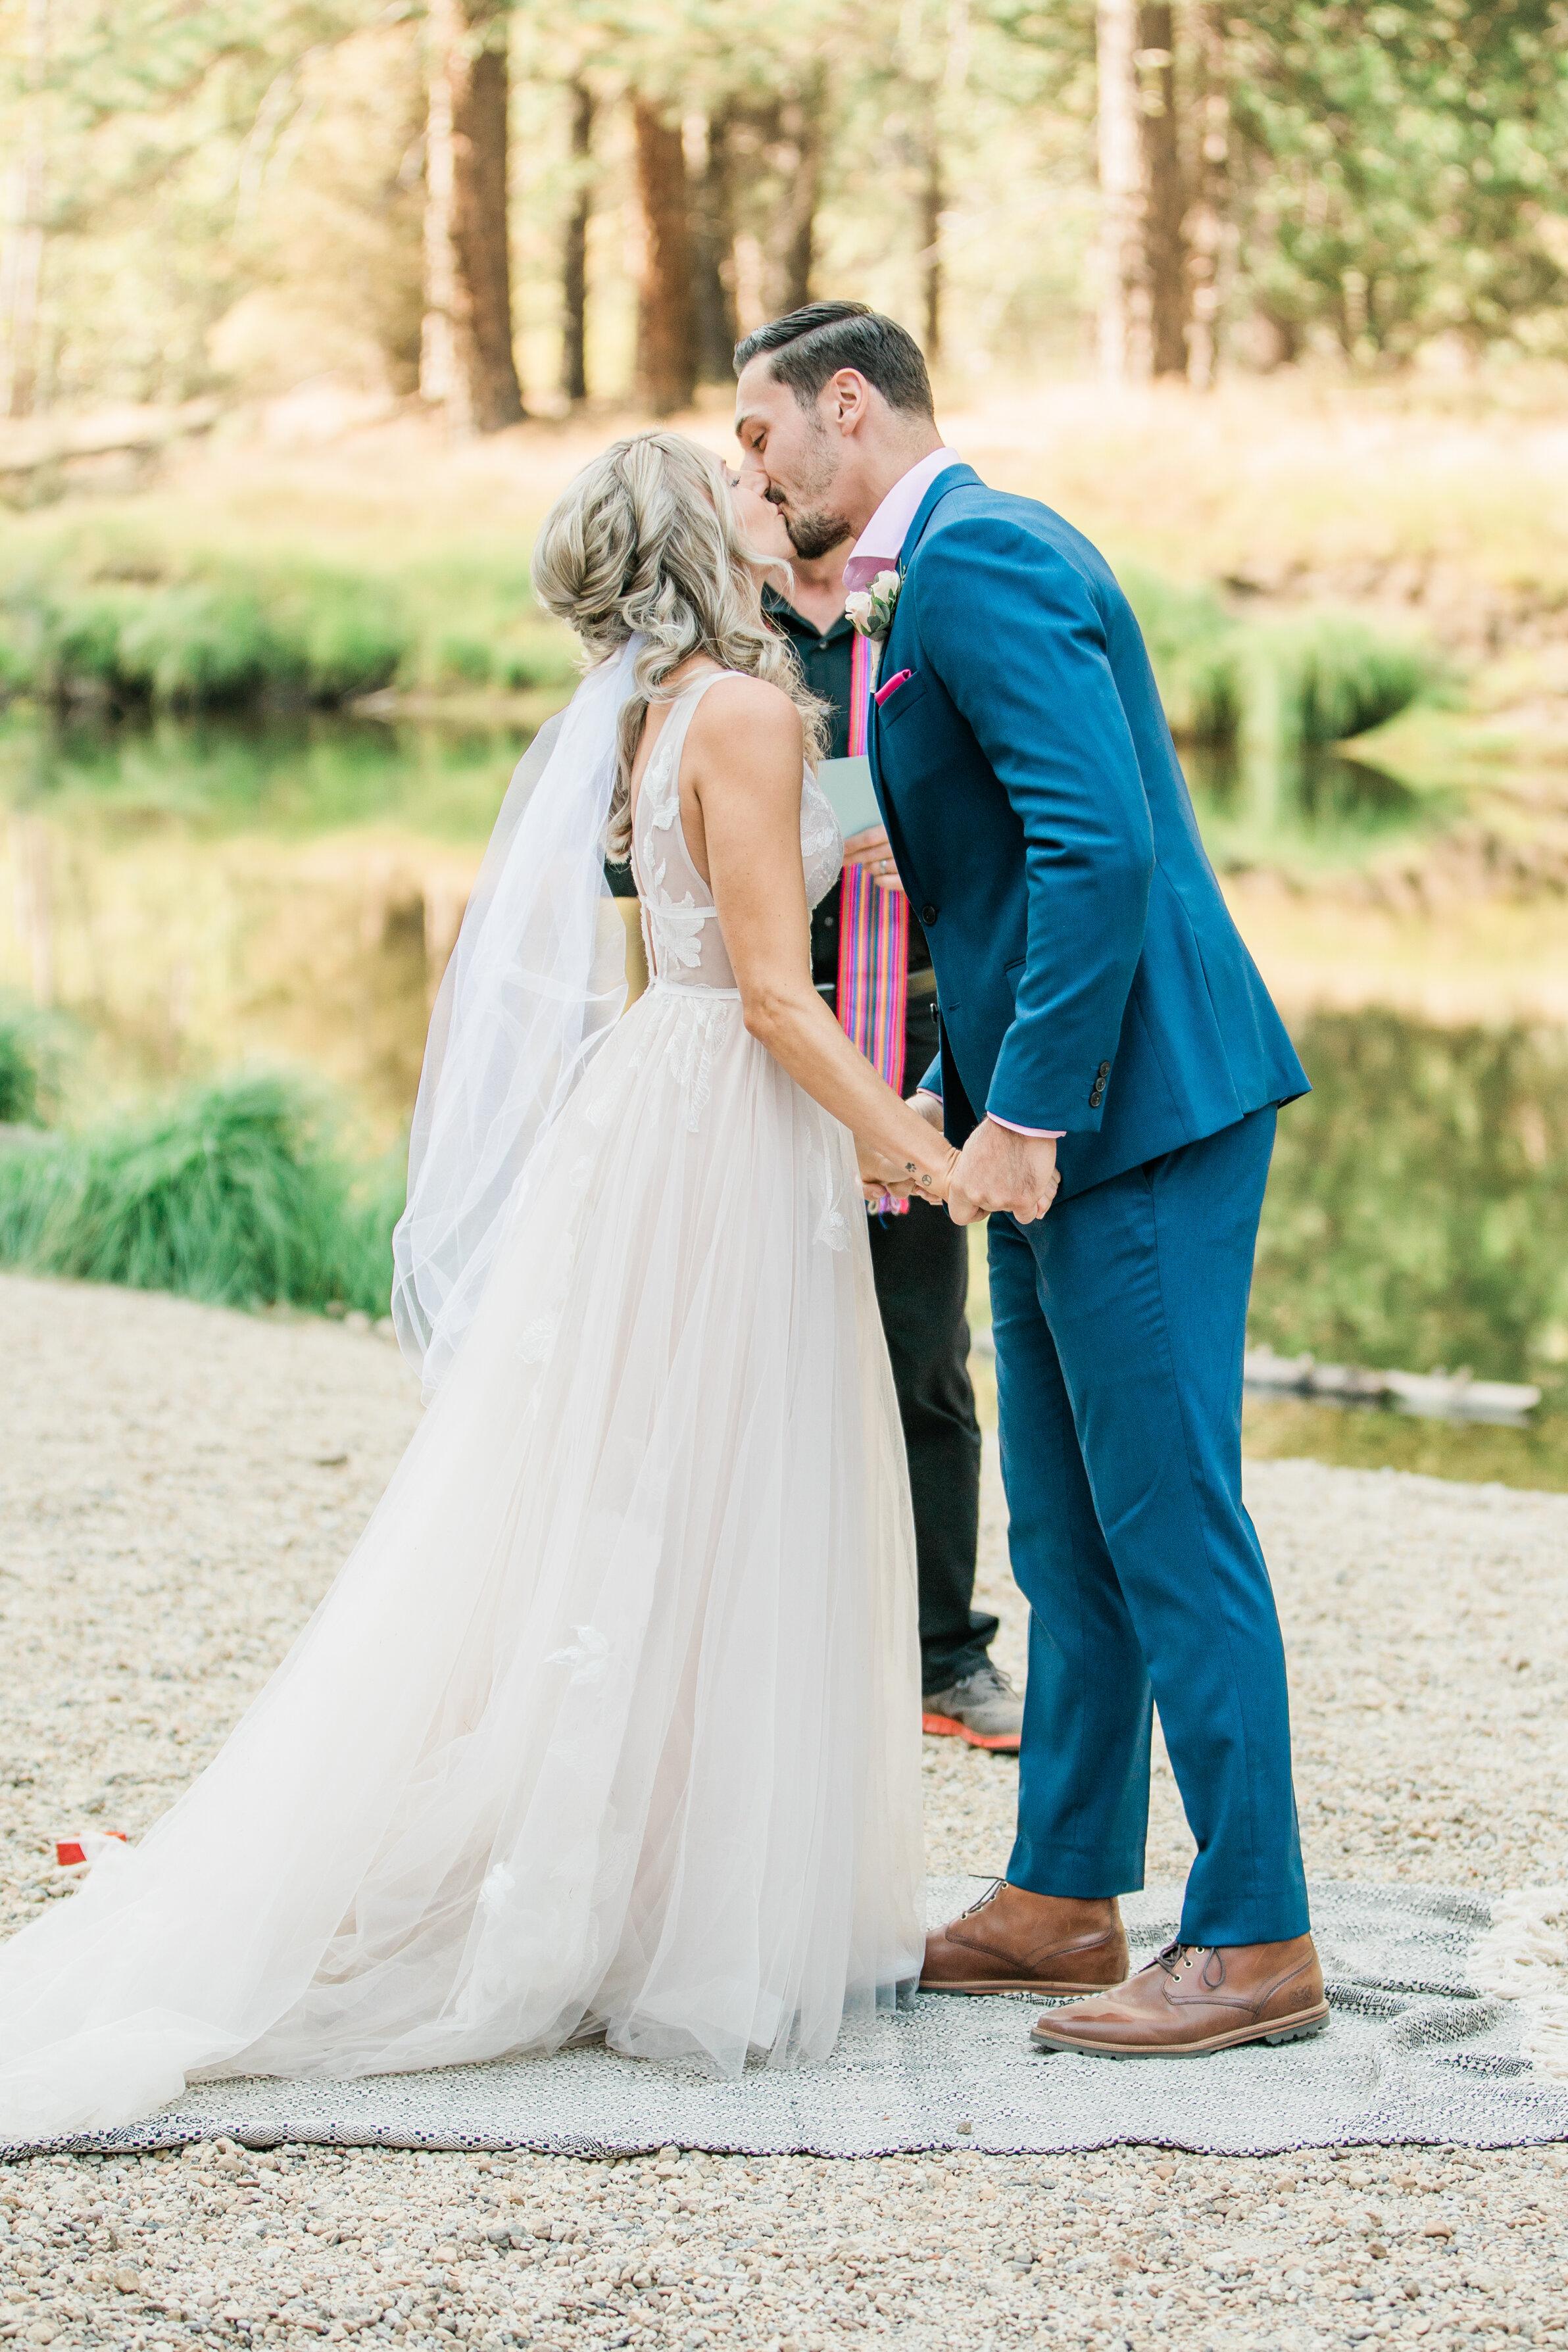 Leanne and Joe - Married - Sneak Peeks - Lauren Alisse Photography-19.jpg